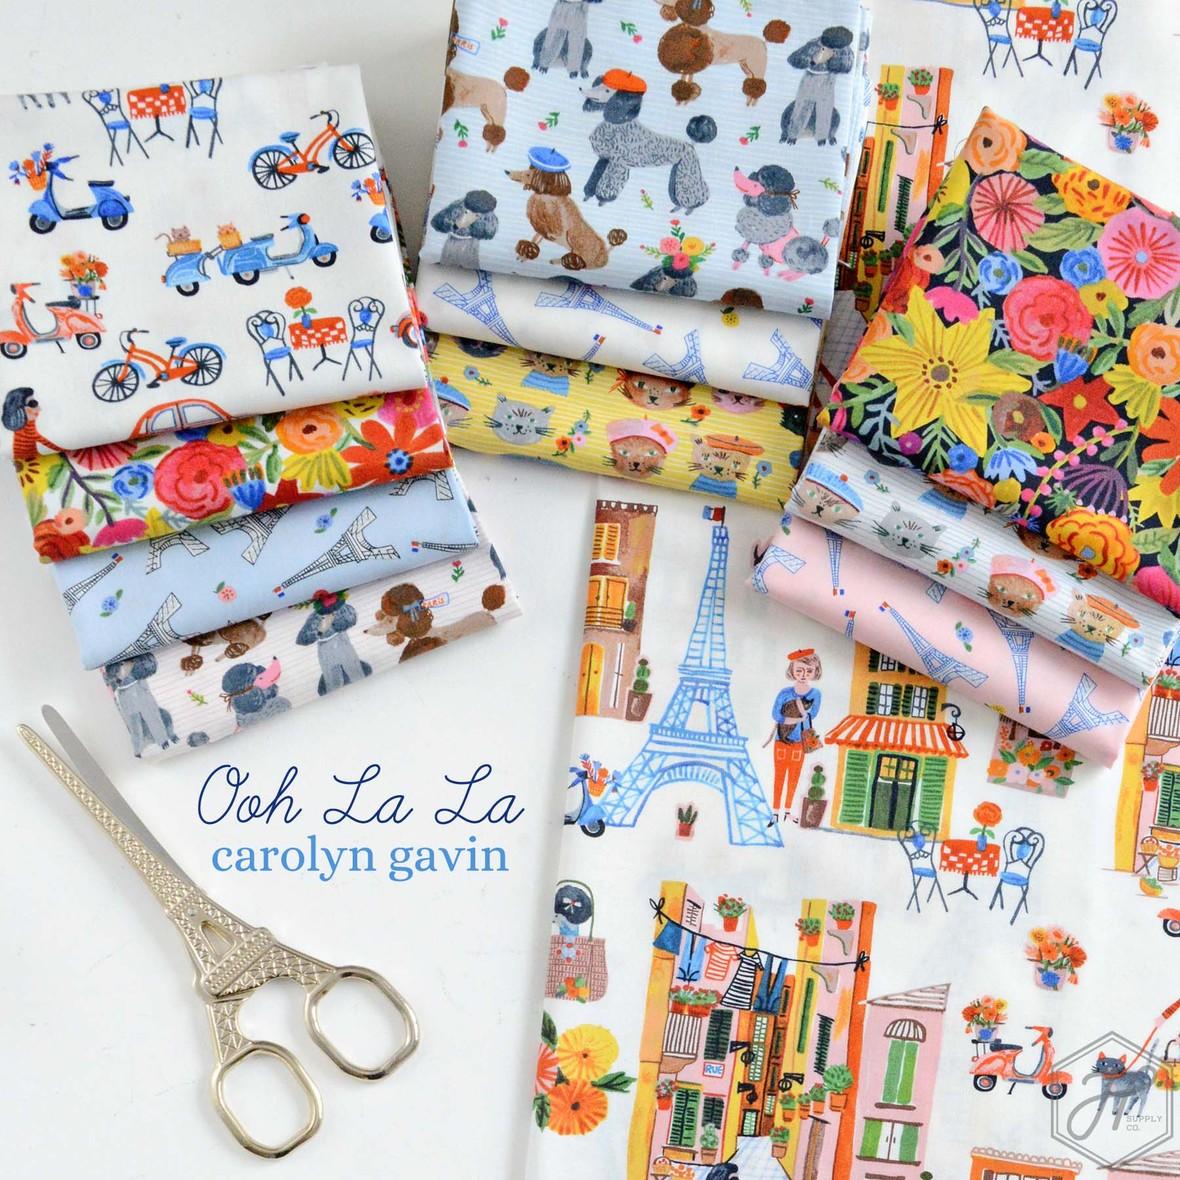 Ooh La La French Fabric Poster Carolyn Gavin at Hawthorne Supply Co